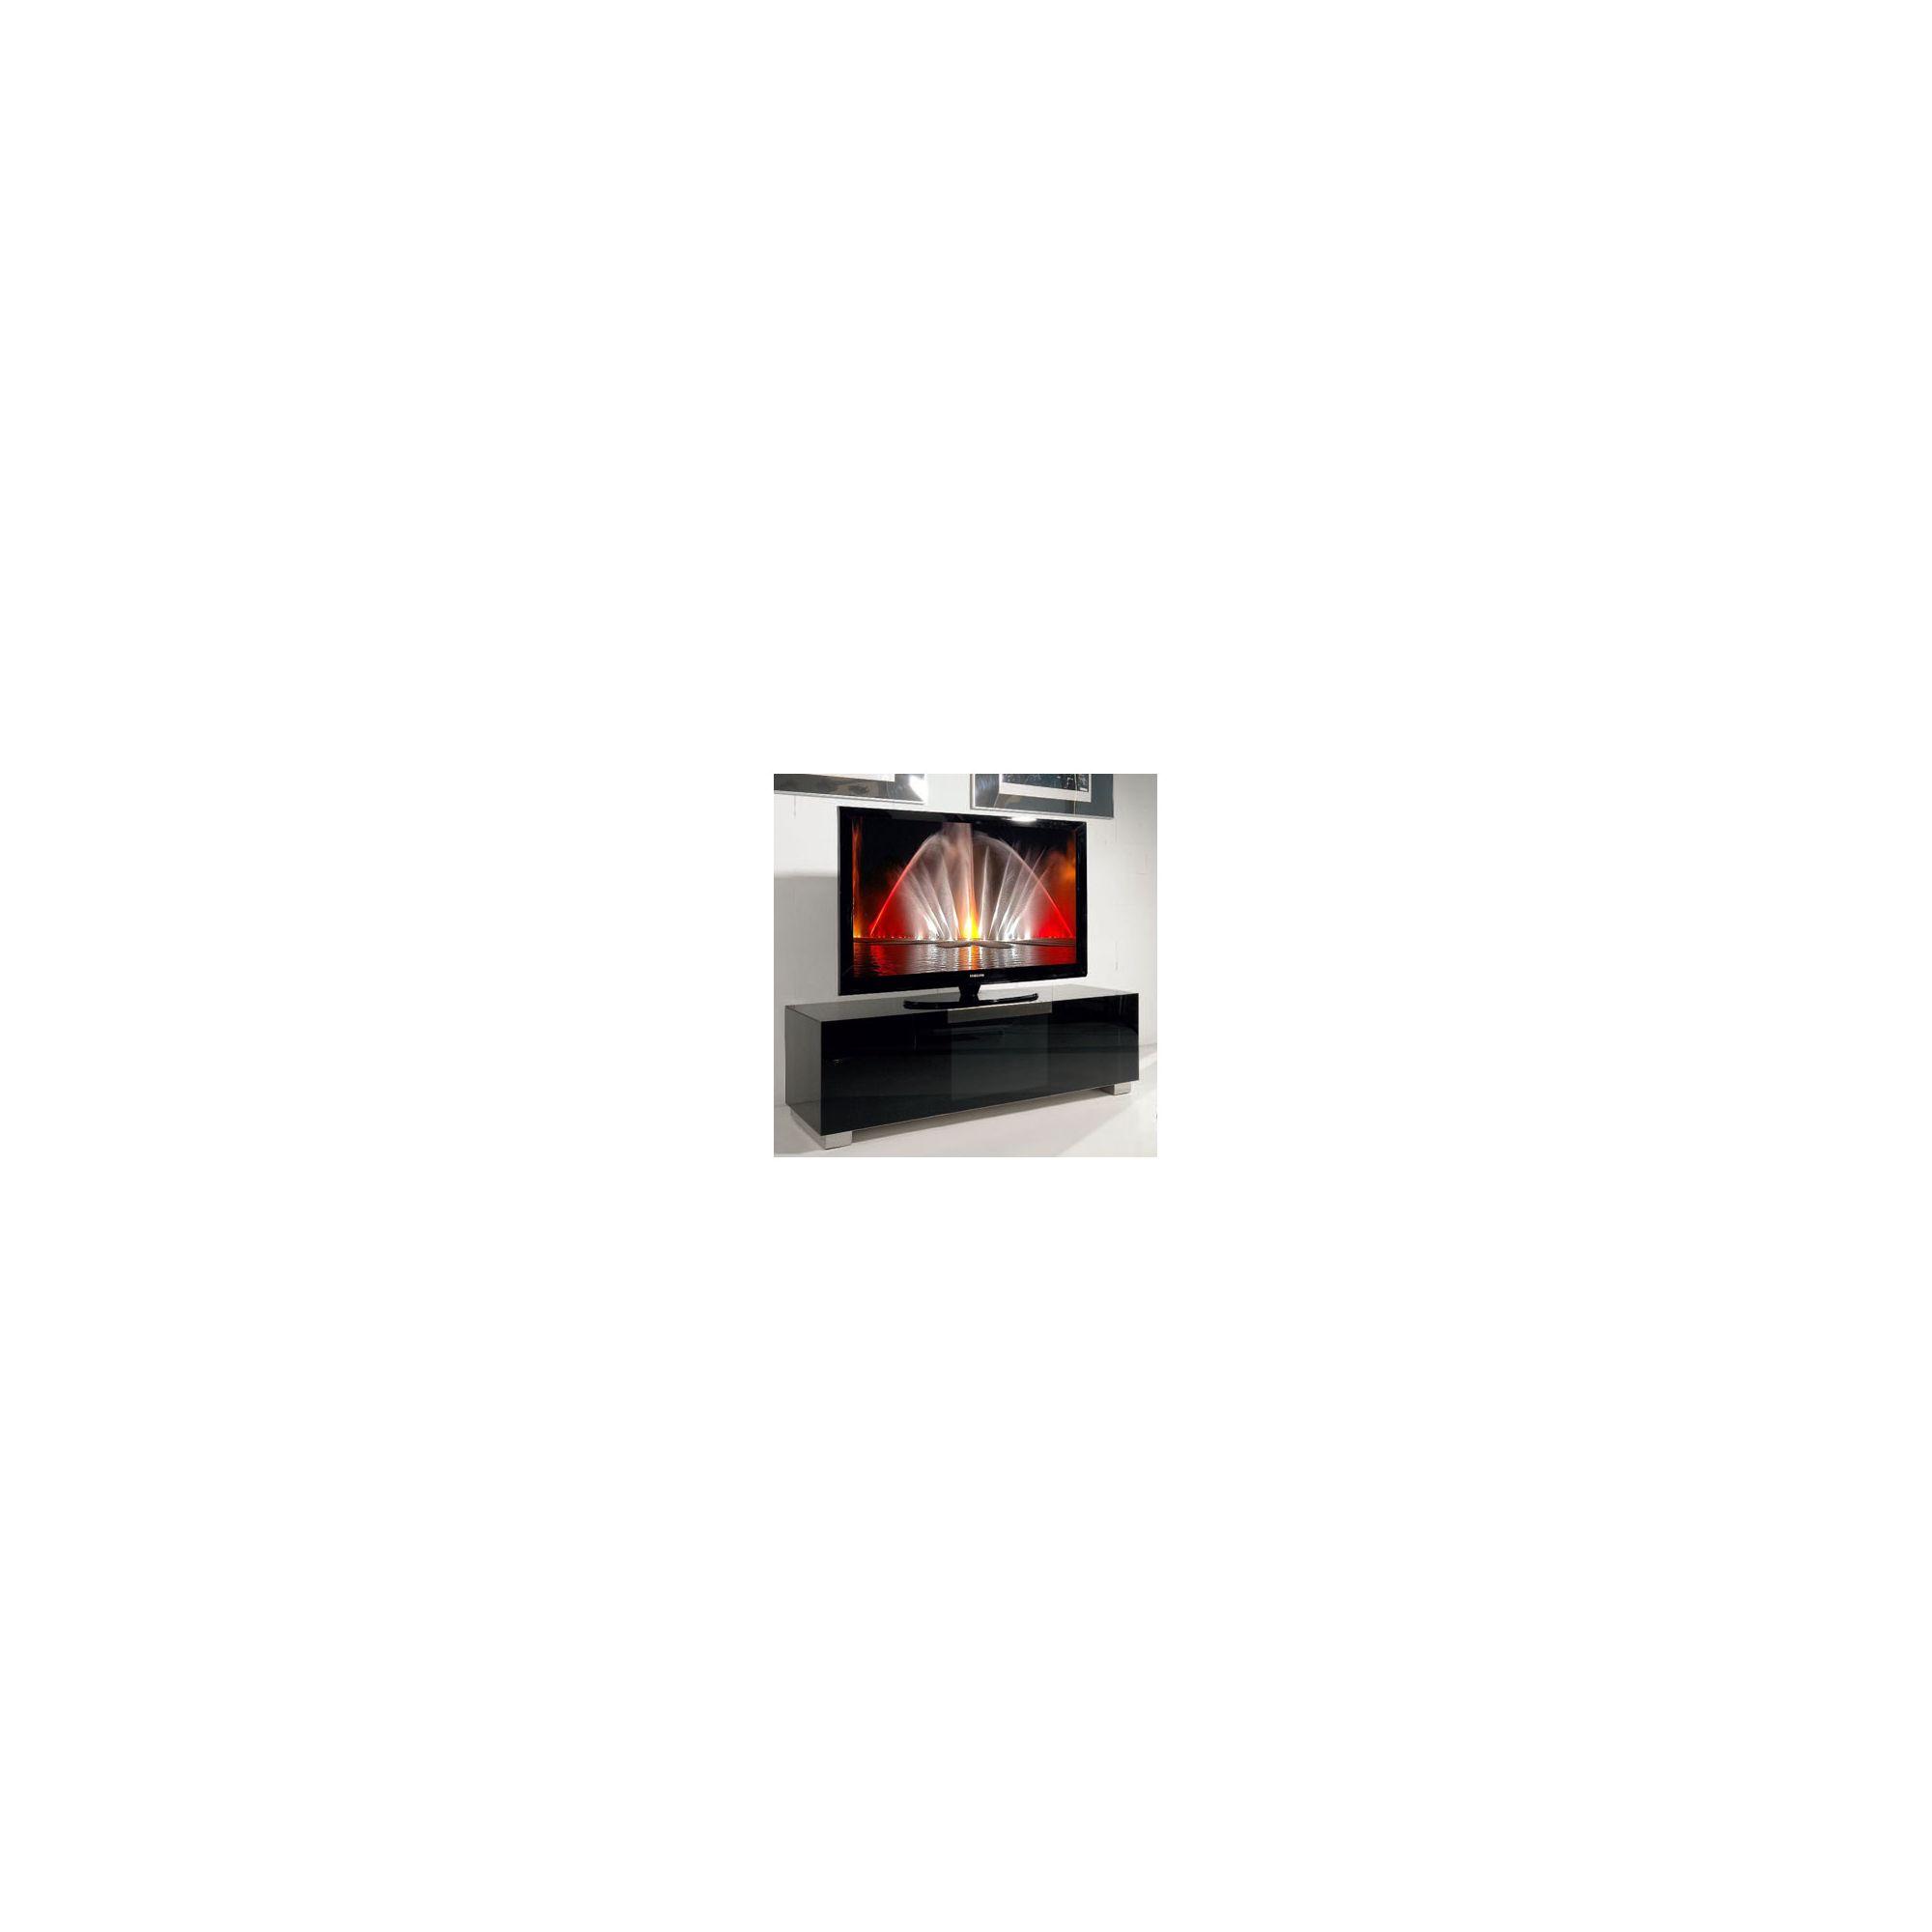 Triskom Stainless Steel / Glass TV Stand for LCD / Plasmas - Black Glass at Tesco Direct